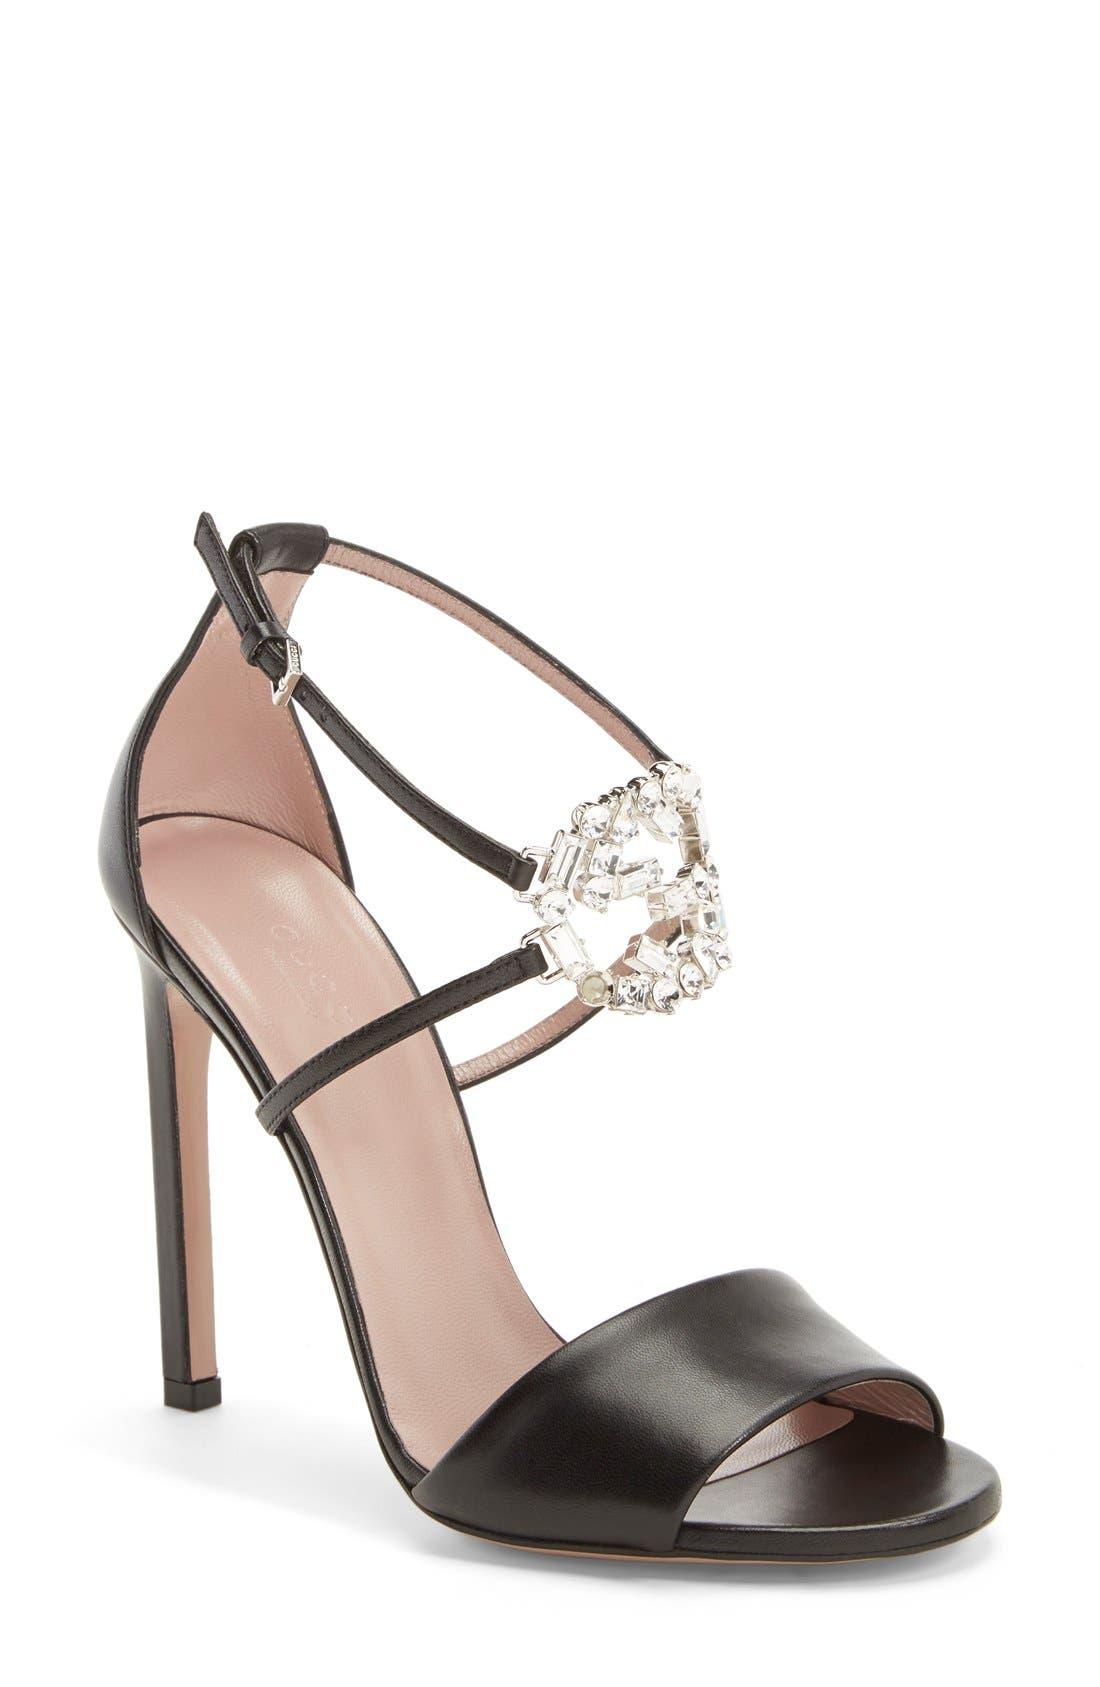 Alternate Image 1 Selected - Gucci 'GG' Logo Ankle Strap Sandal (Women)